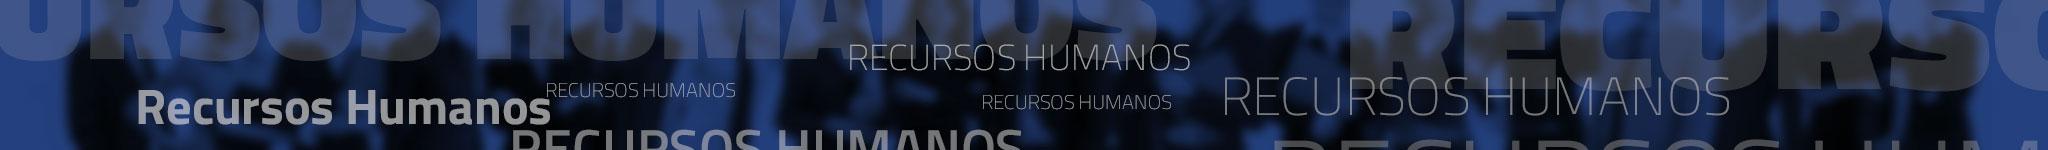 recursoshumanos